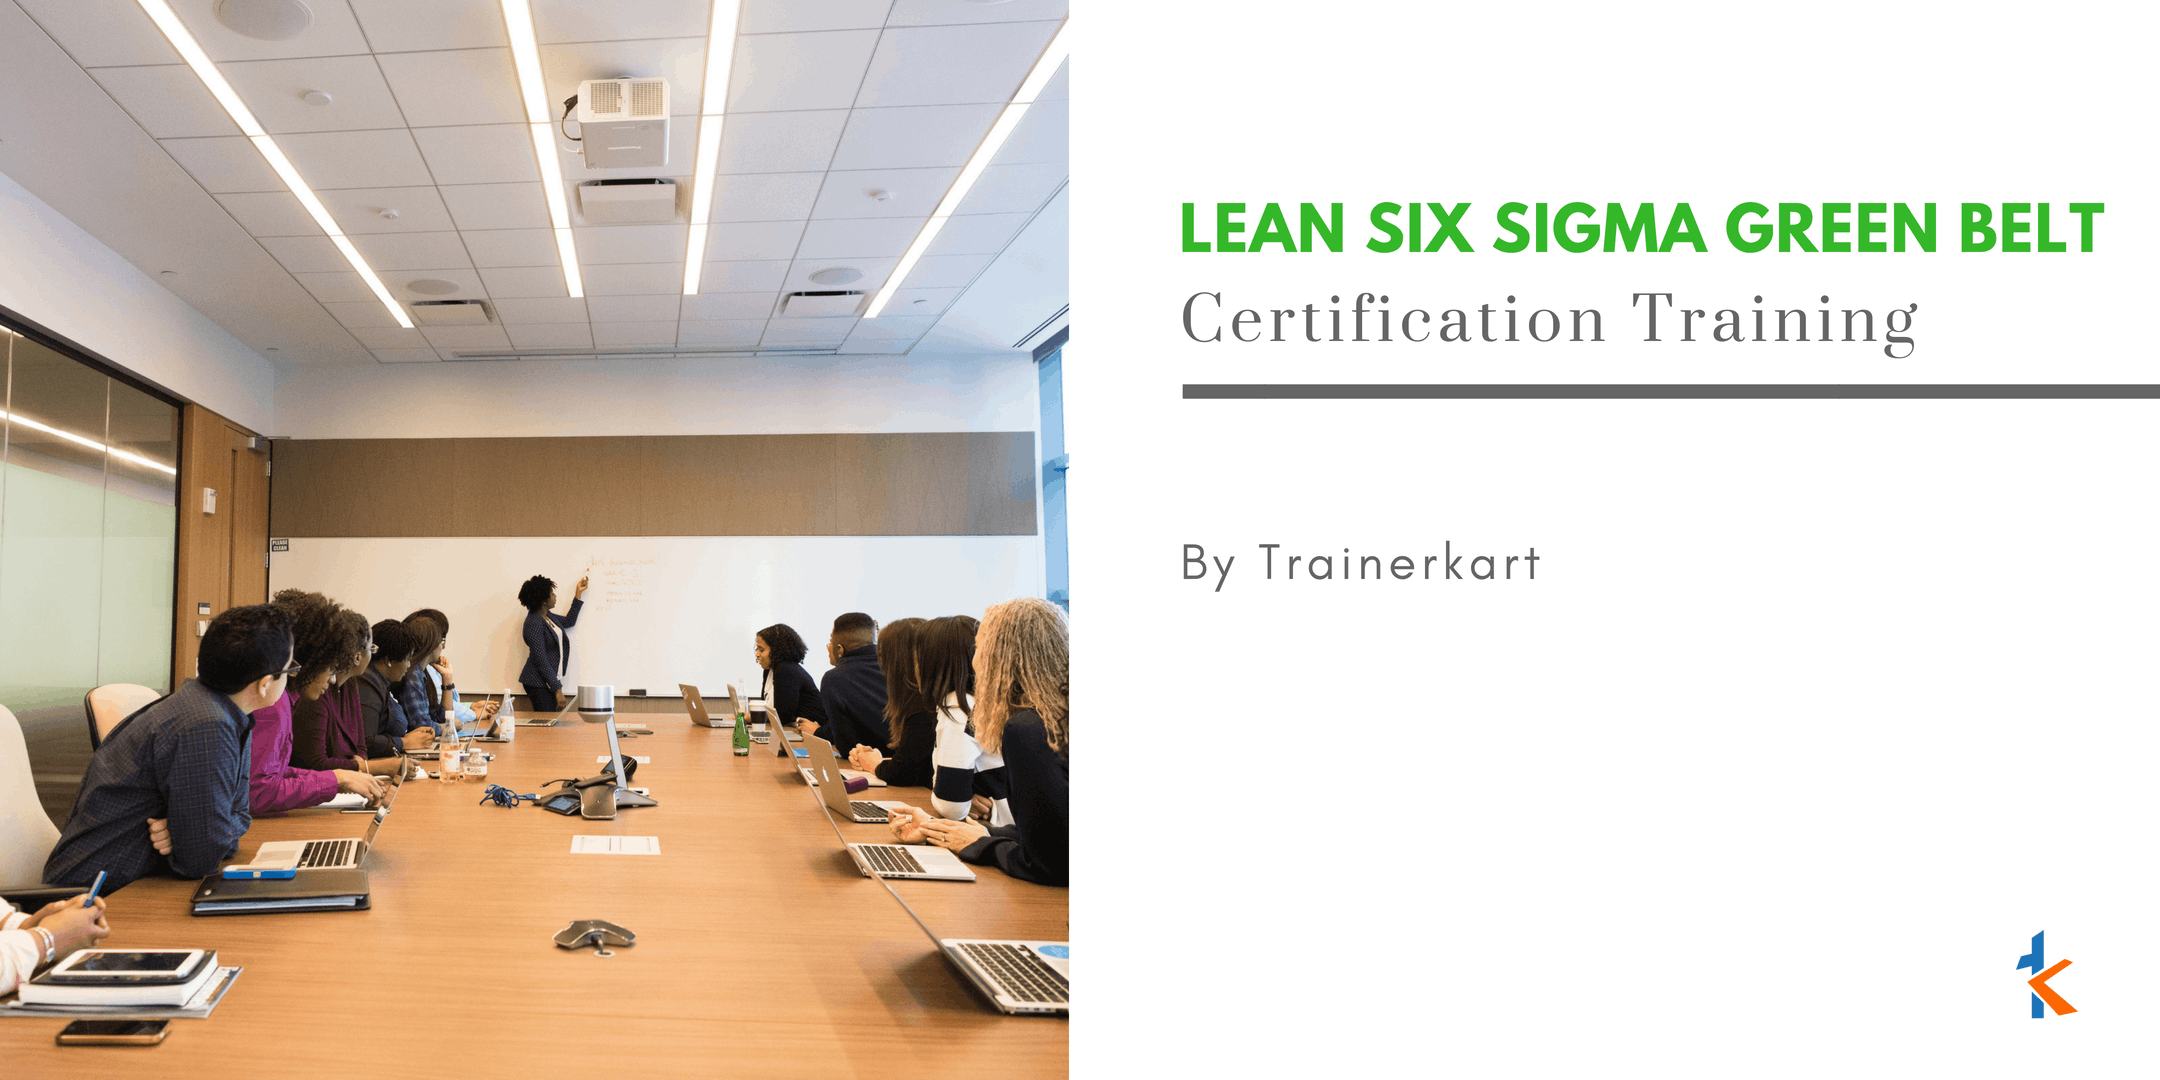 Lean Six Sigma Green Belt Training in Jamesto